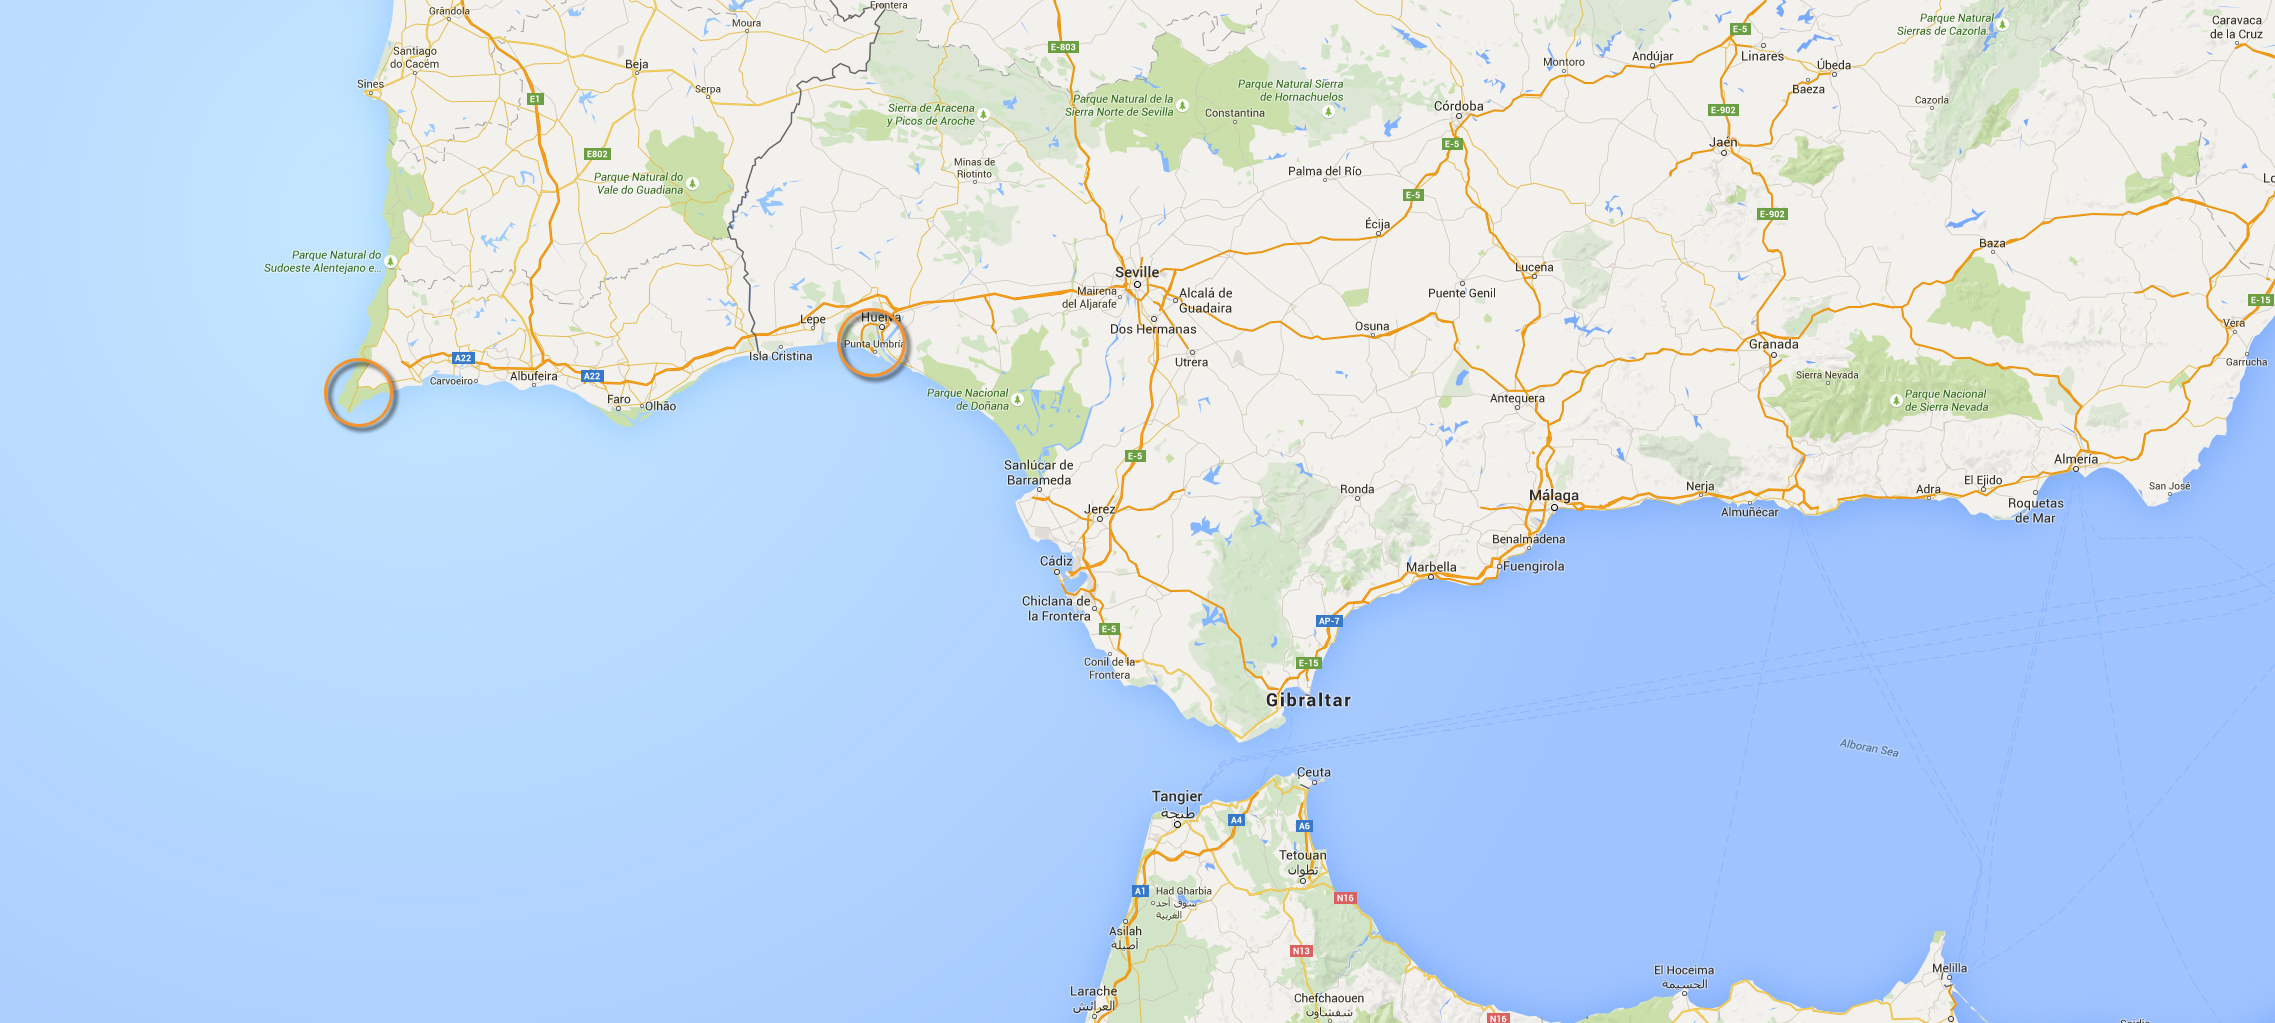 Sagres-Map